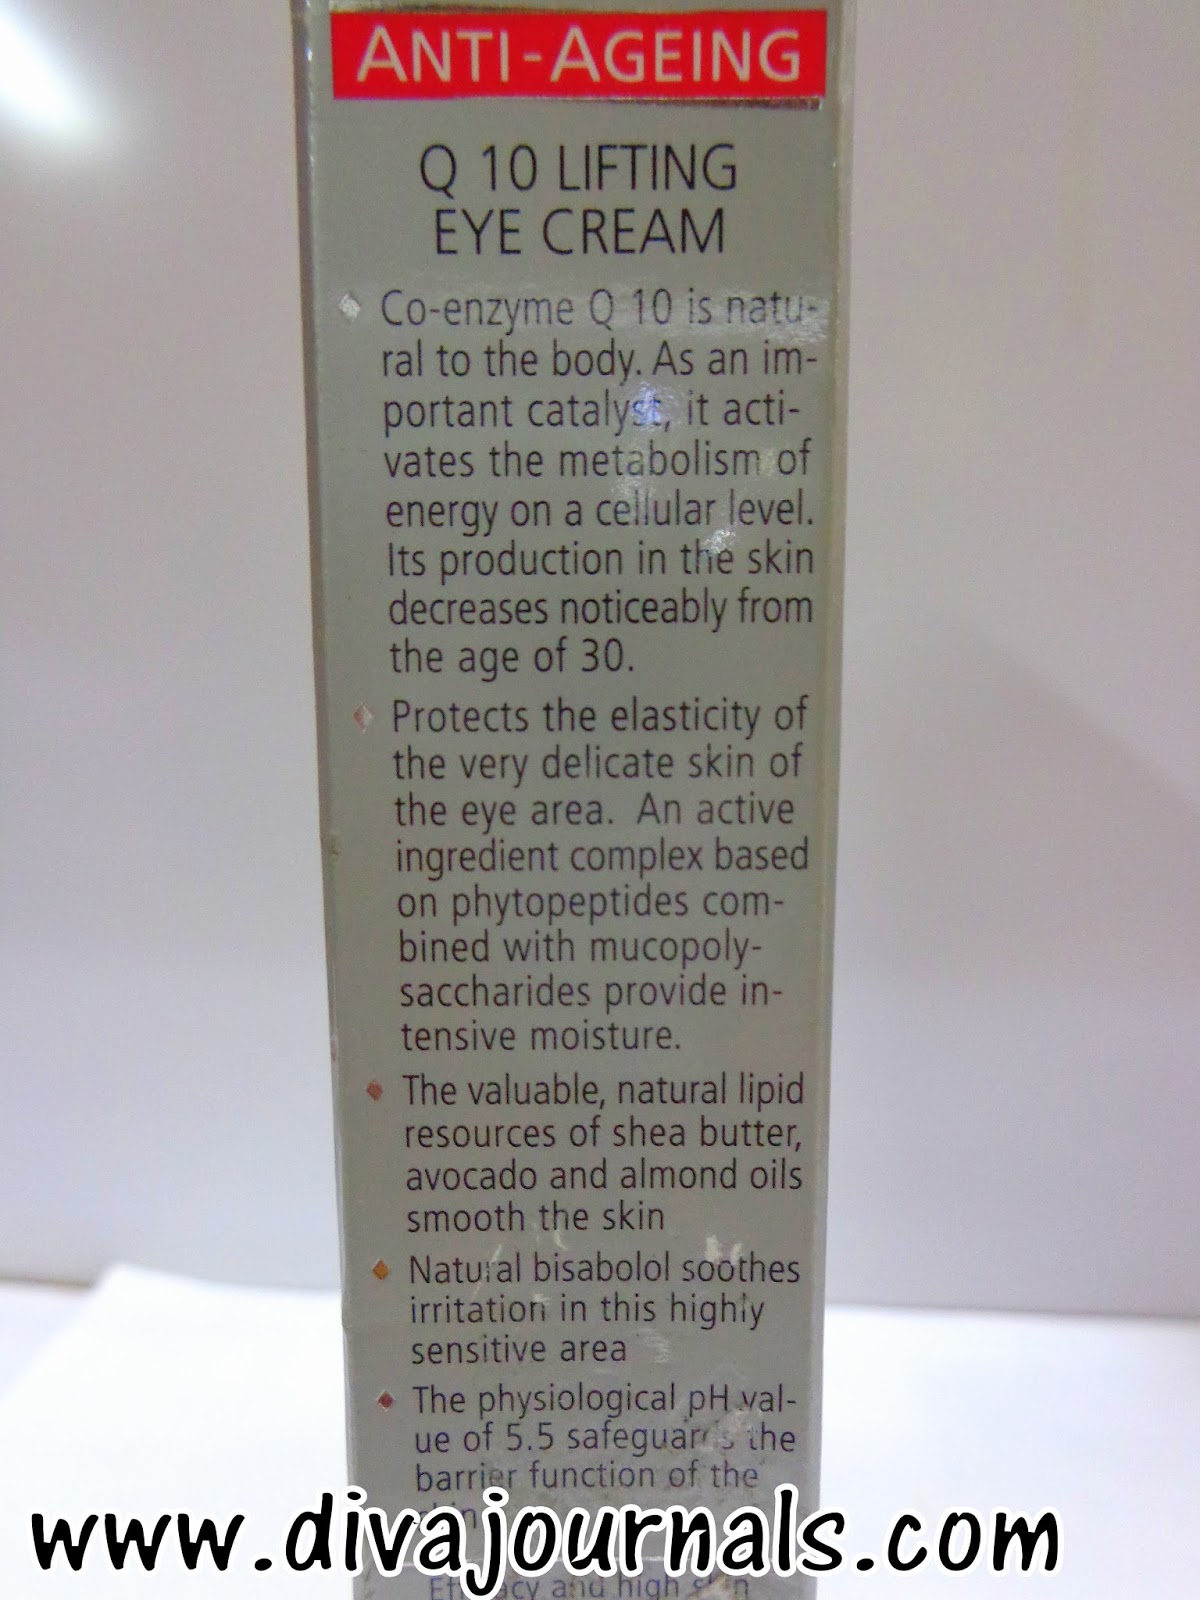 Sebamed Anti-Aging Q10 Lifting Eye Cream Review